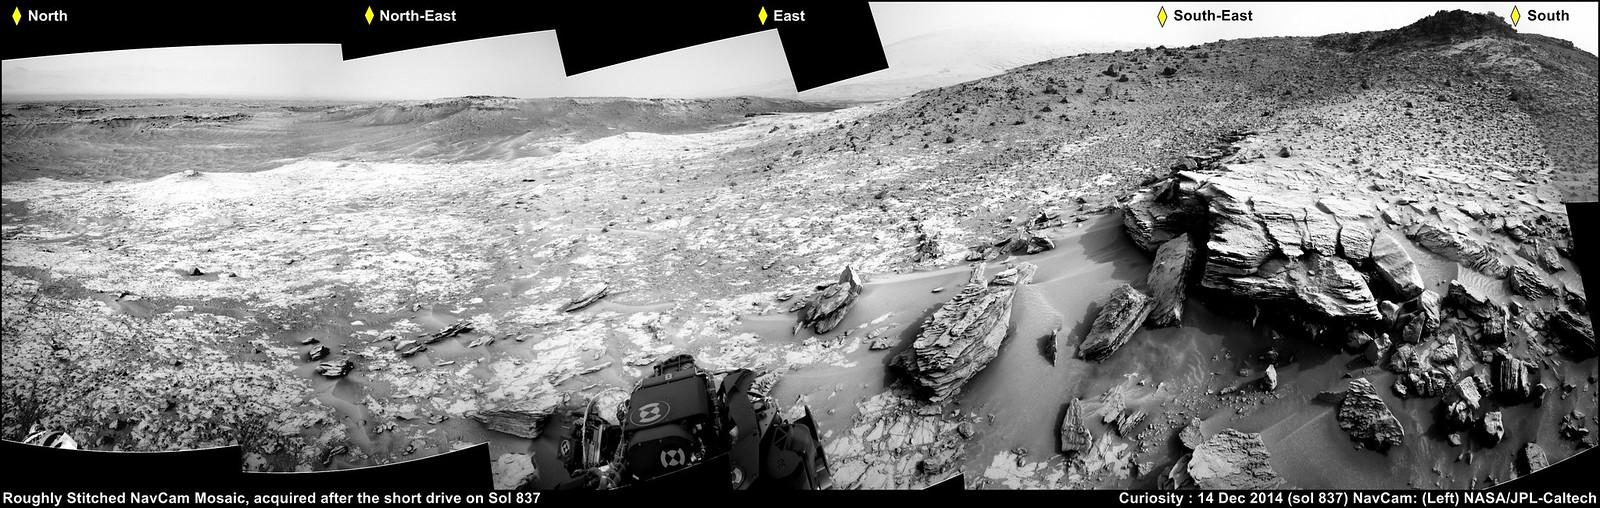 Mars : Curiosity Rover - Whale Rock Mosaic